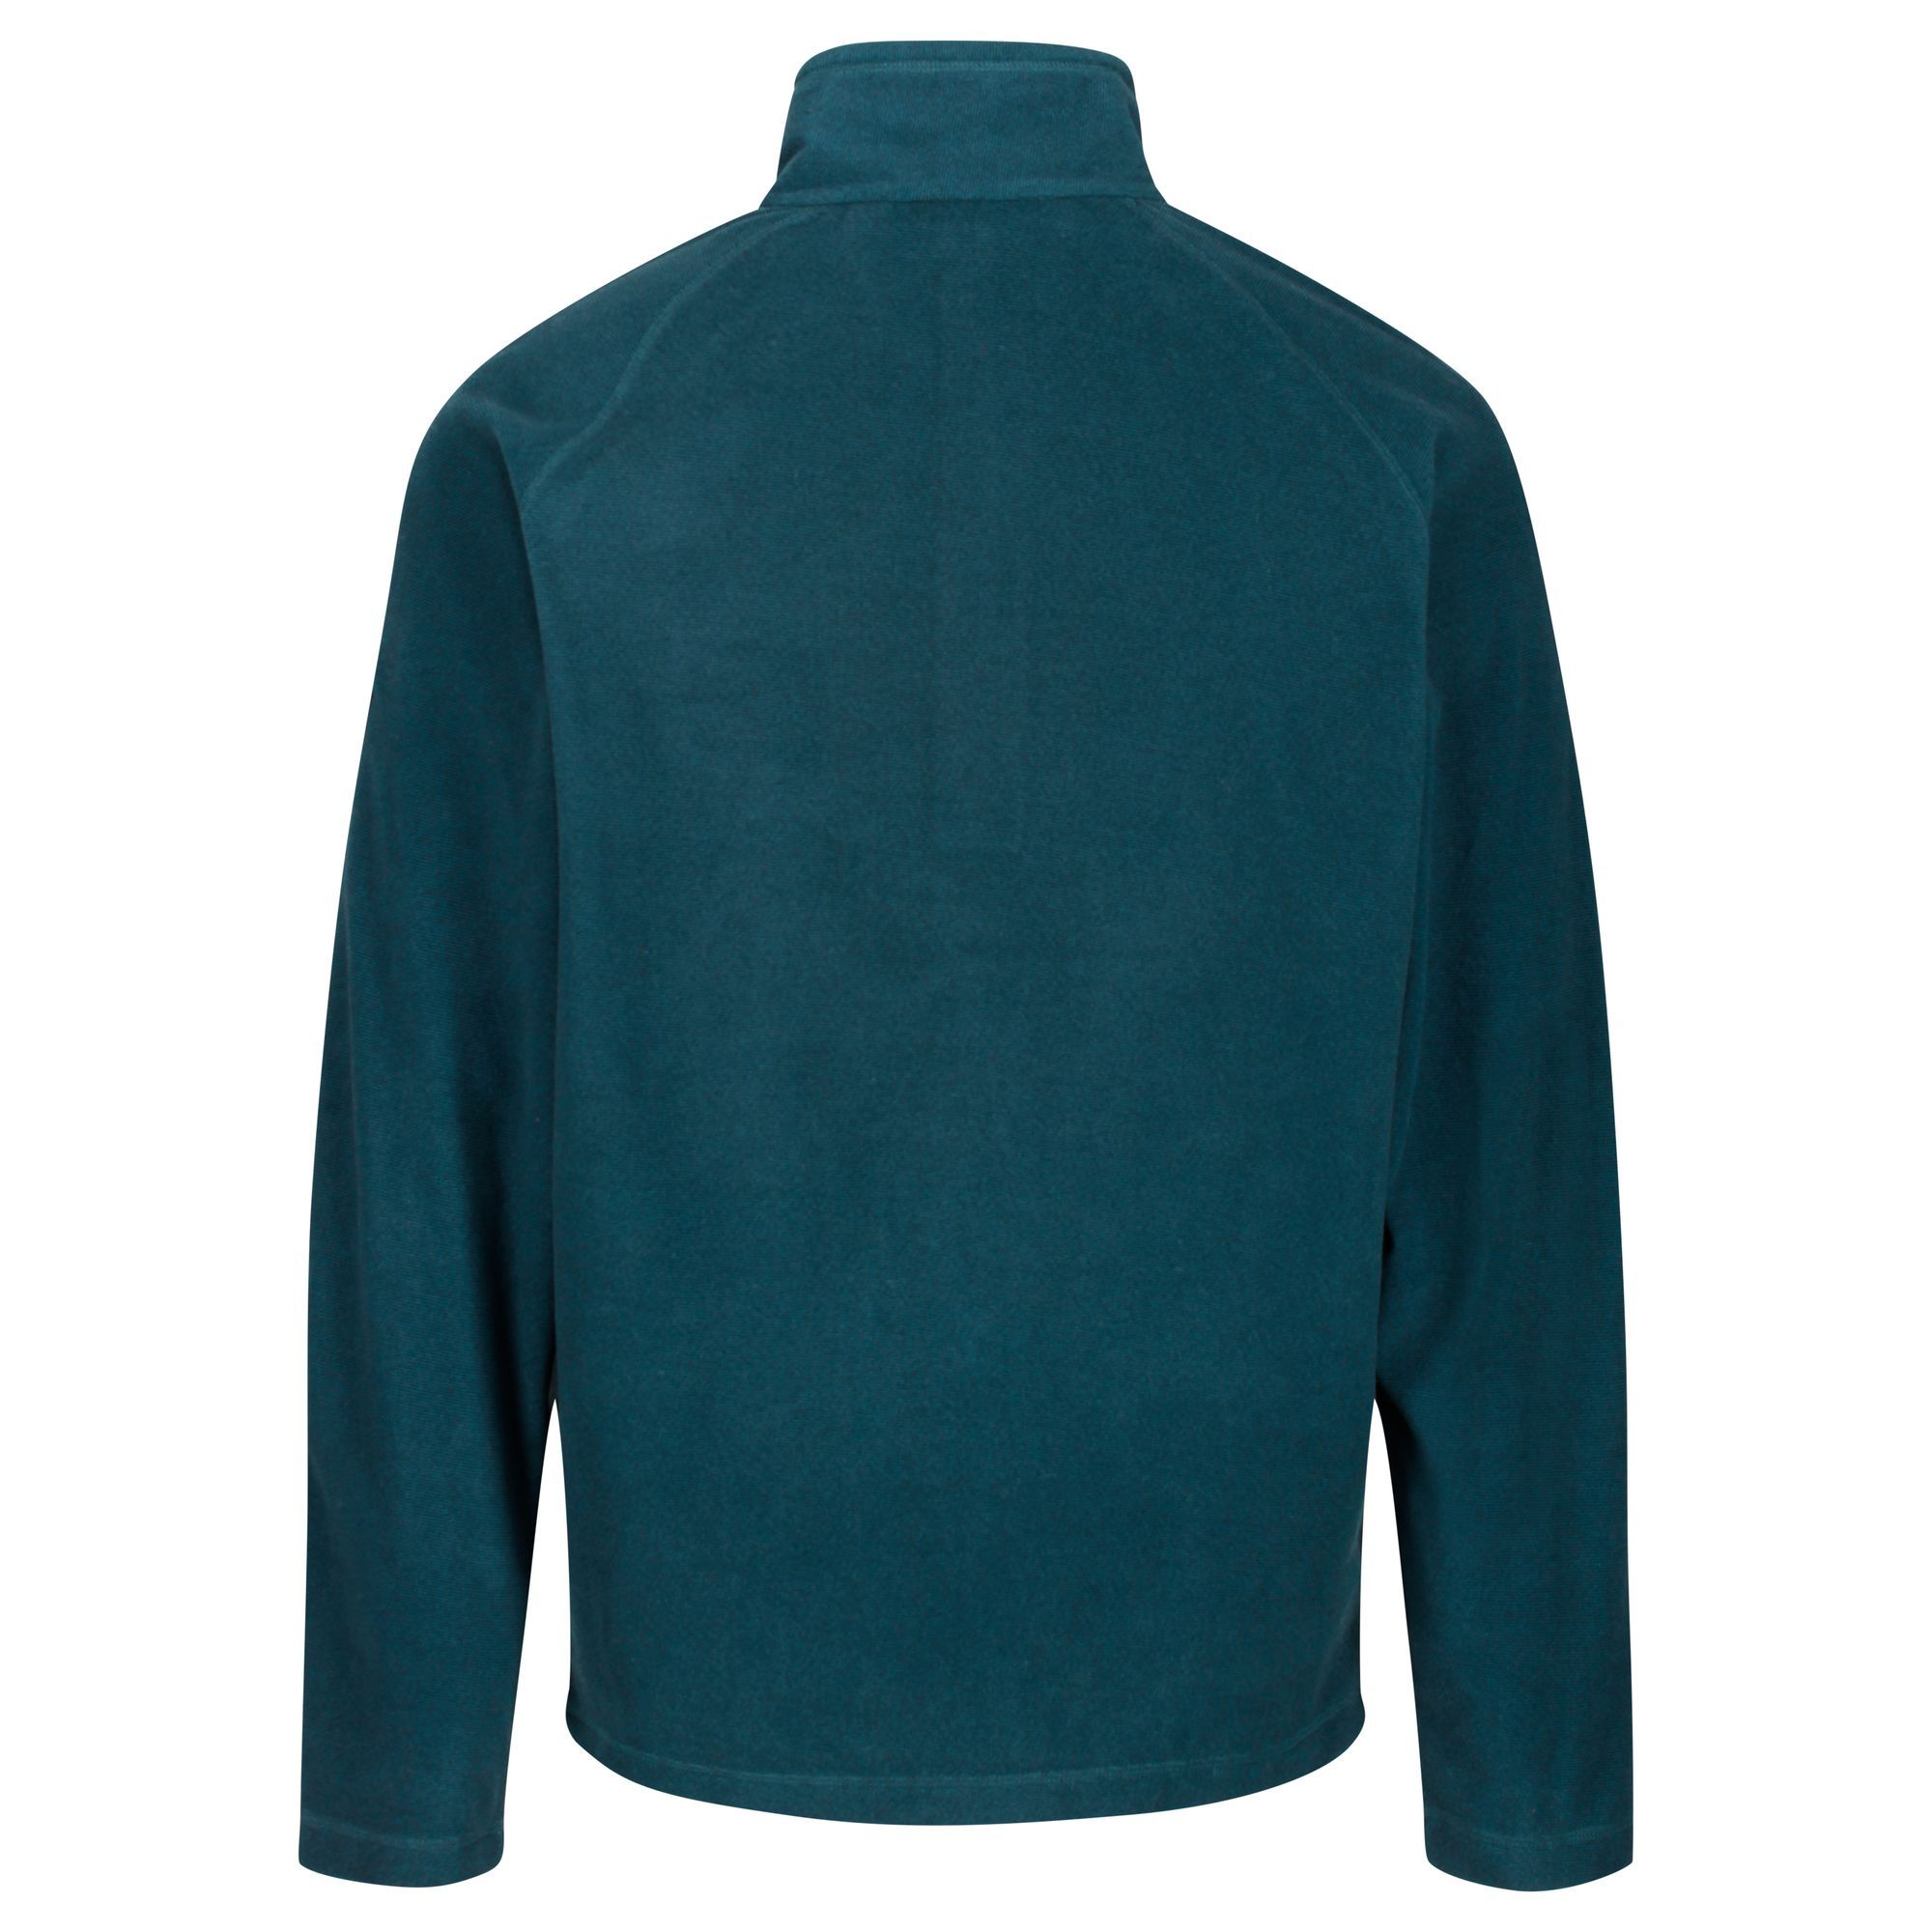 Regatta-Mens-Fleece-Jacket-amp-Hoodie-Massive-Clearance-RRP-60 thumbnail 54